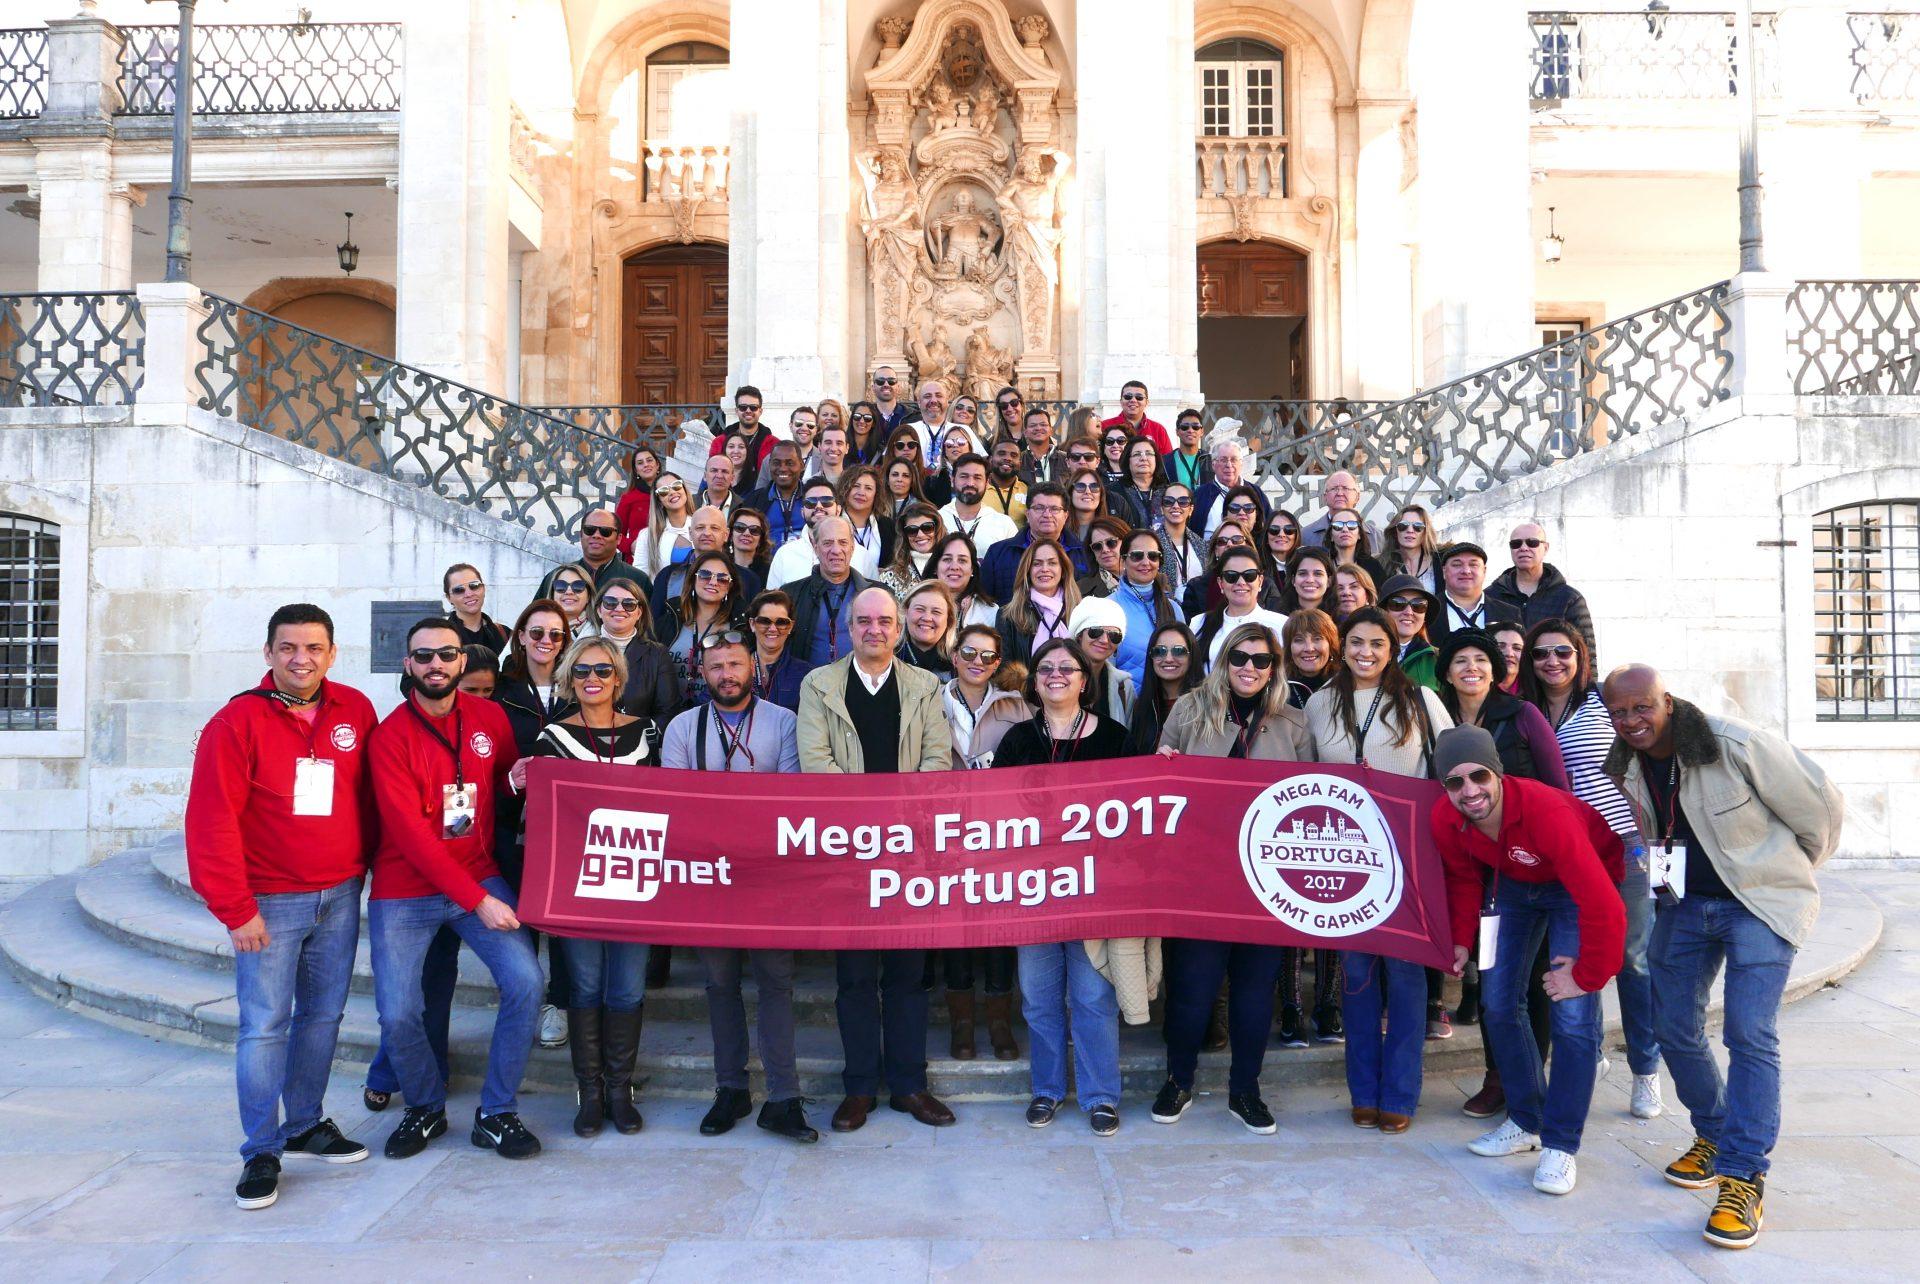 A foto oficial do Megafam MMTGapnet na Universidade de Coimbra